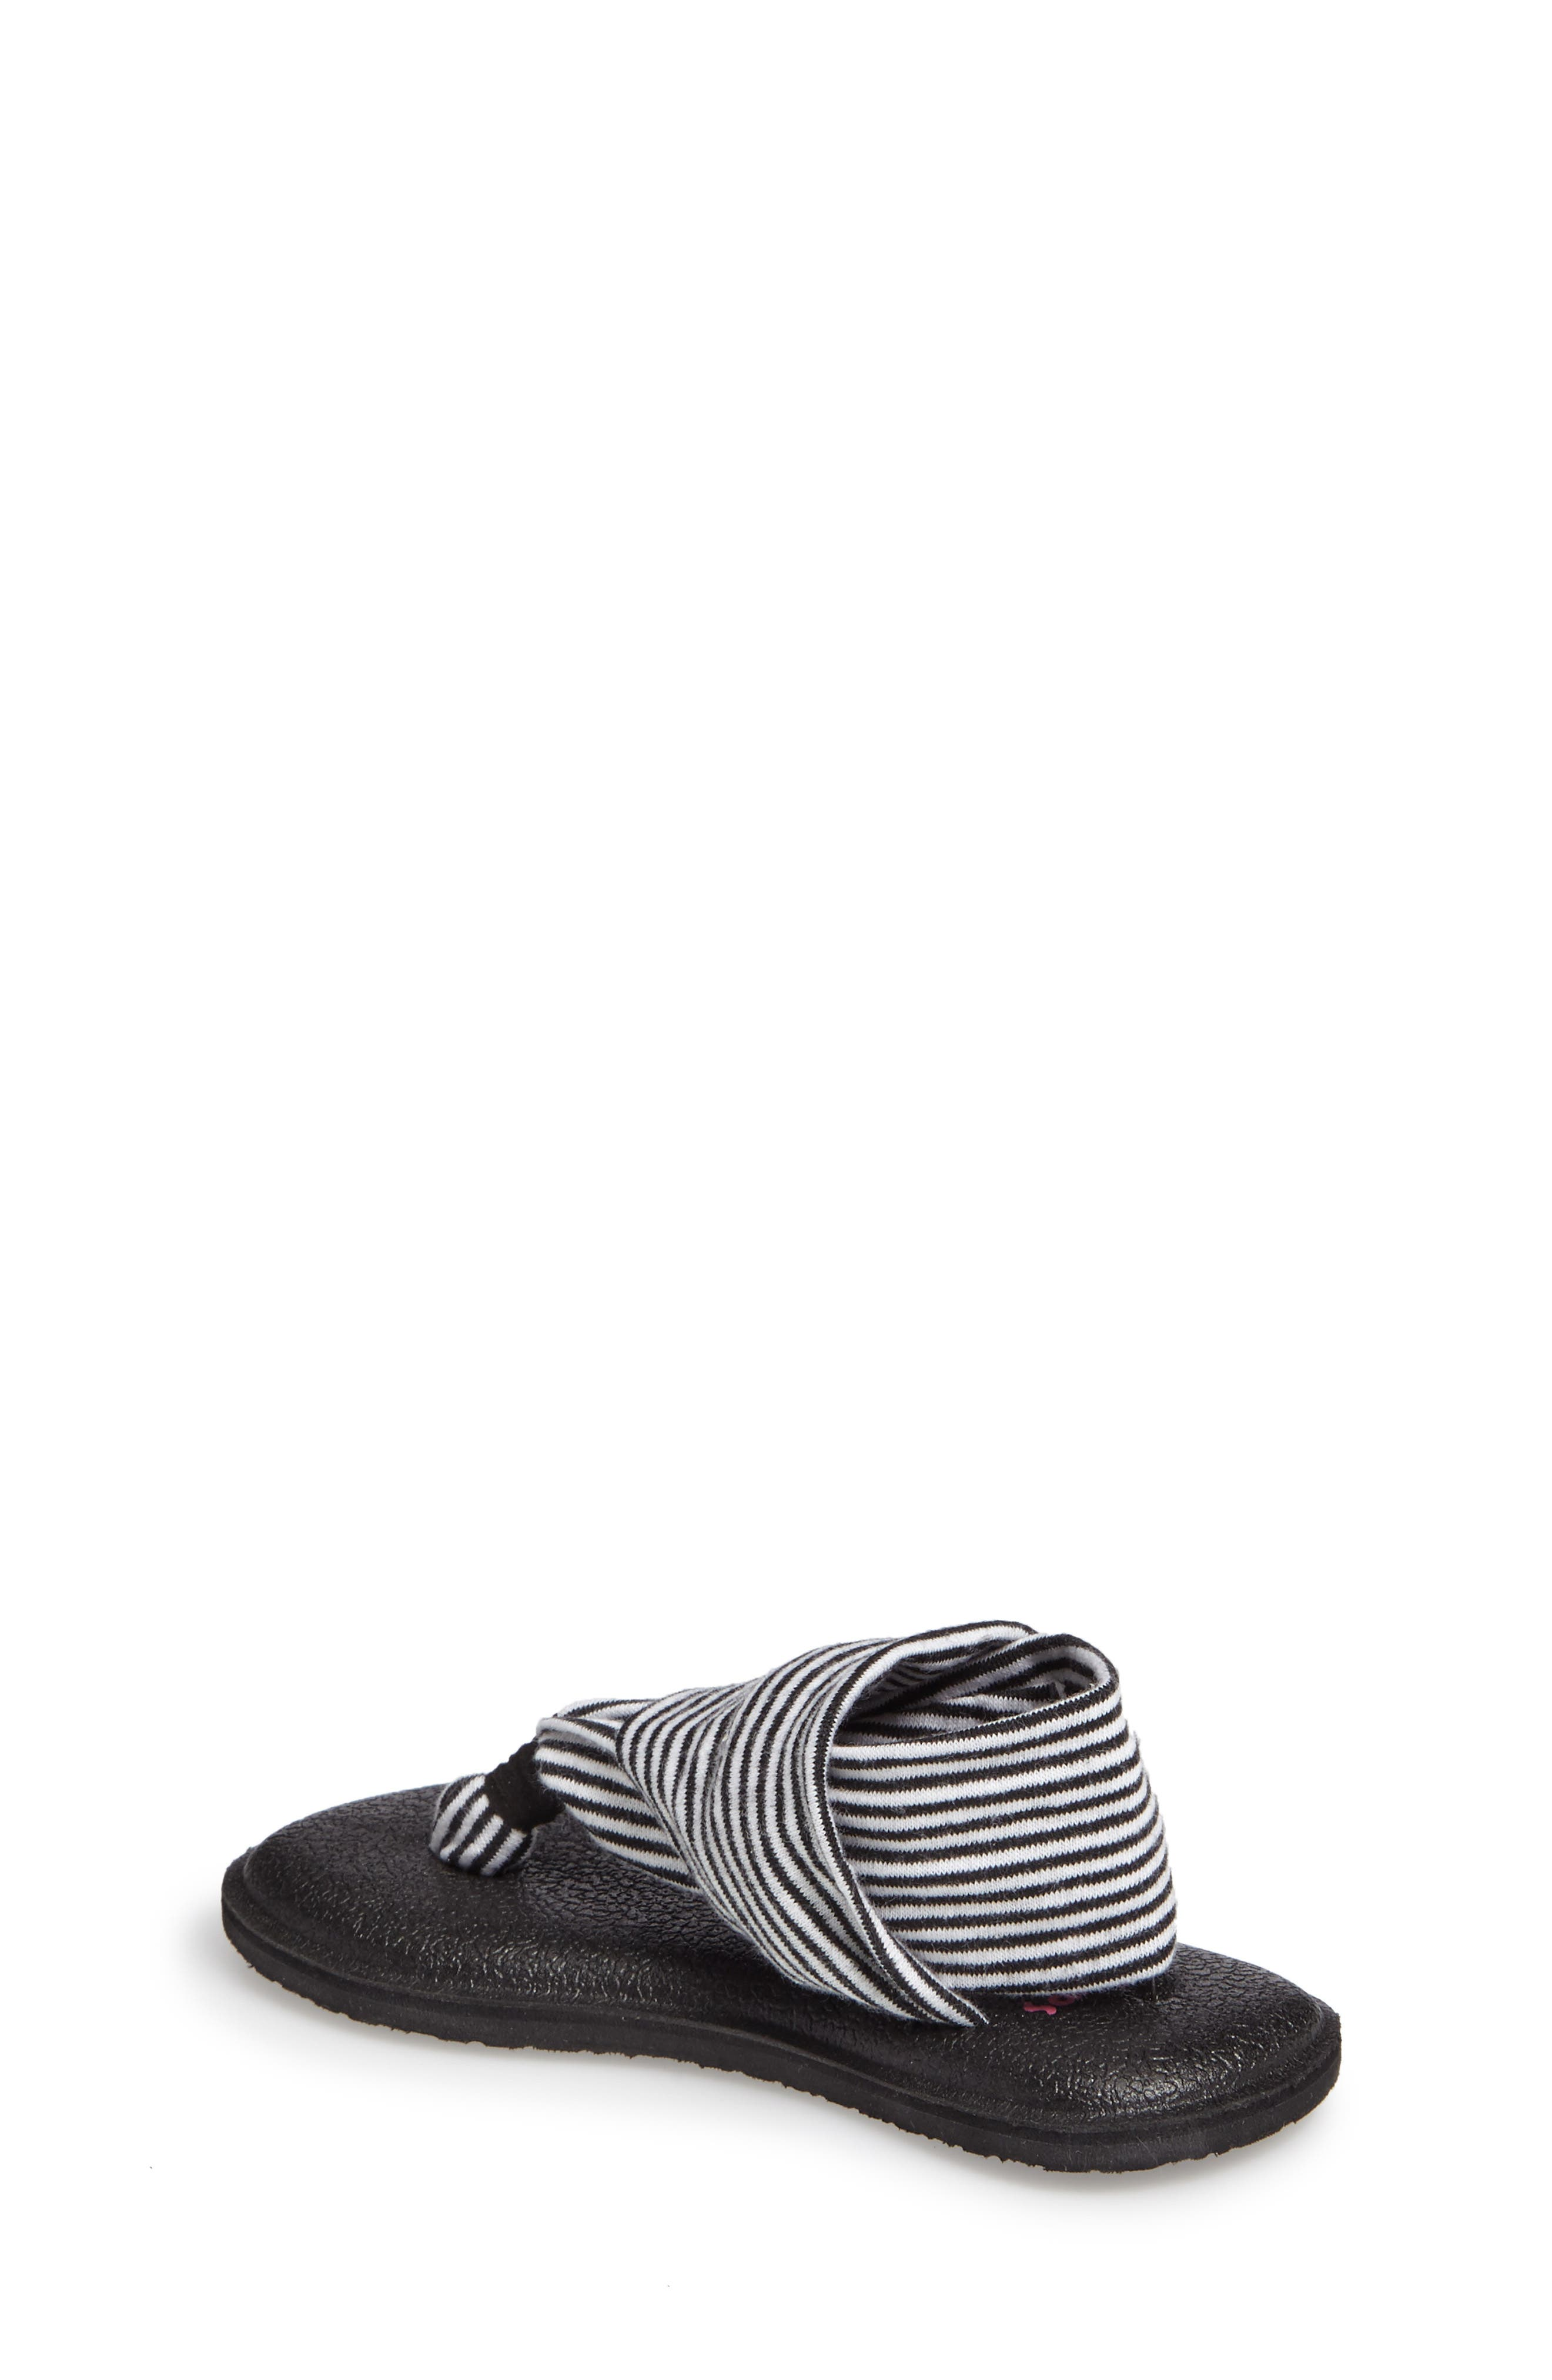 sanuk style yoga sandals flip sling pin mats eddie pinterest flop bauer mat great